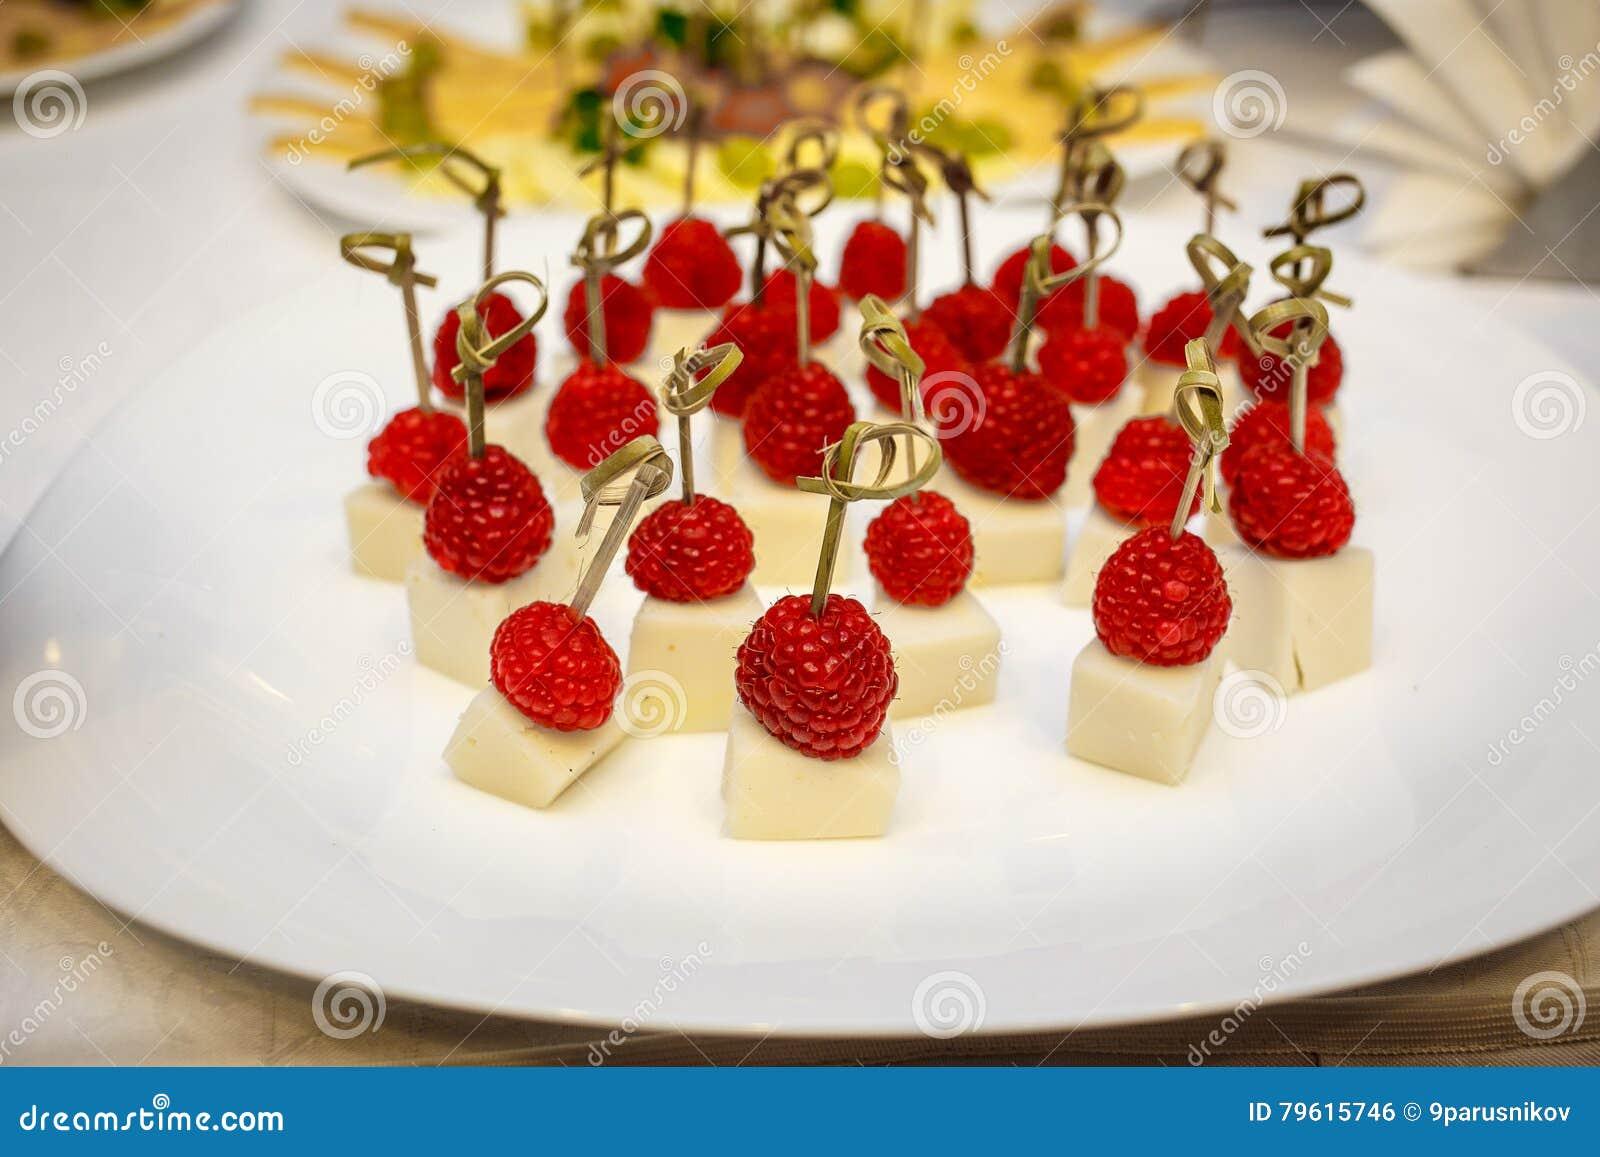 Canapes da sobremesa - framboesas no queijo